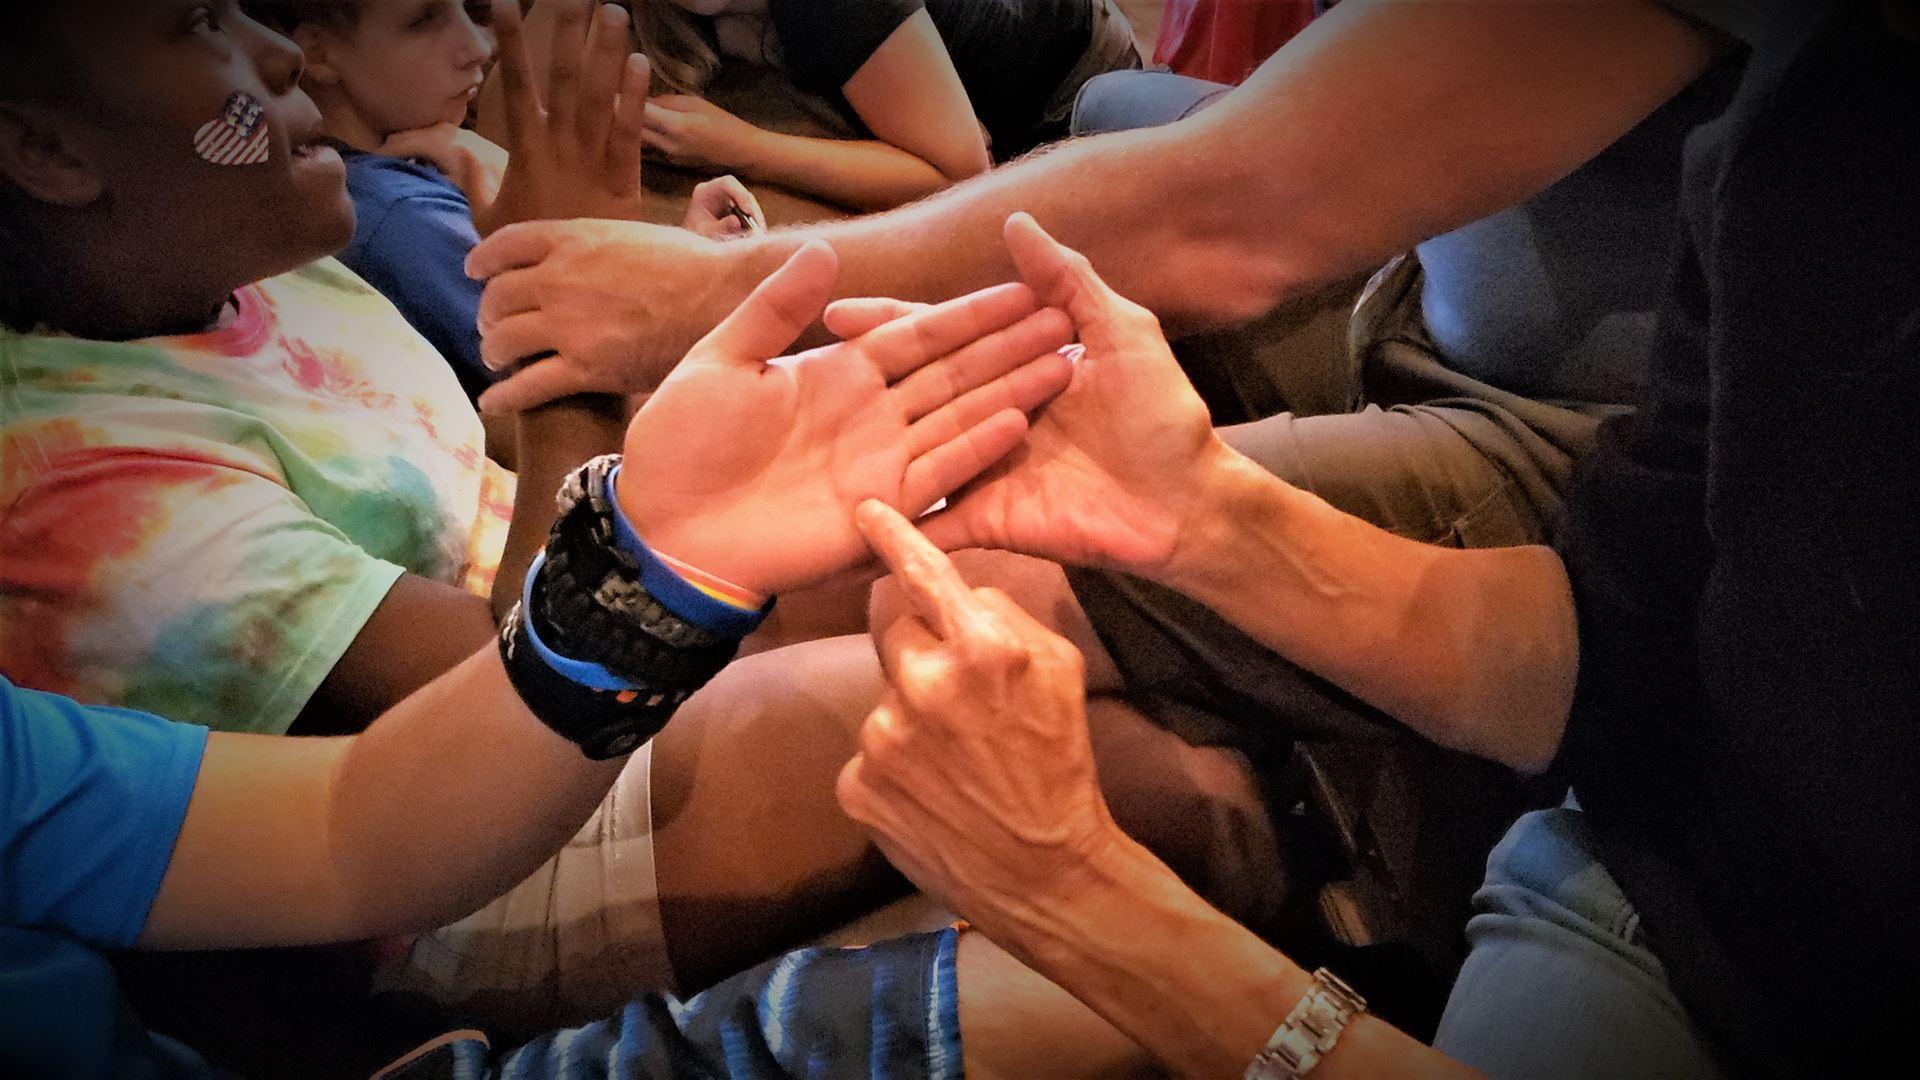 DeafBlind adults socialize deafblind Jrs to protactile philosophy and language principles.